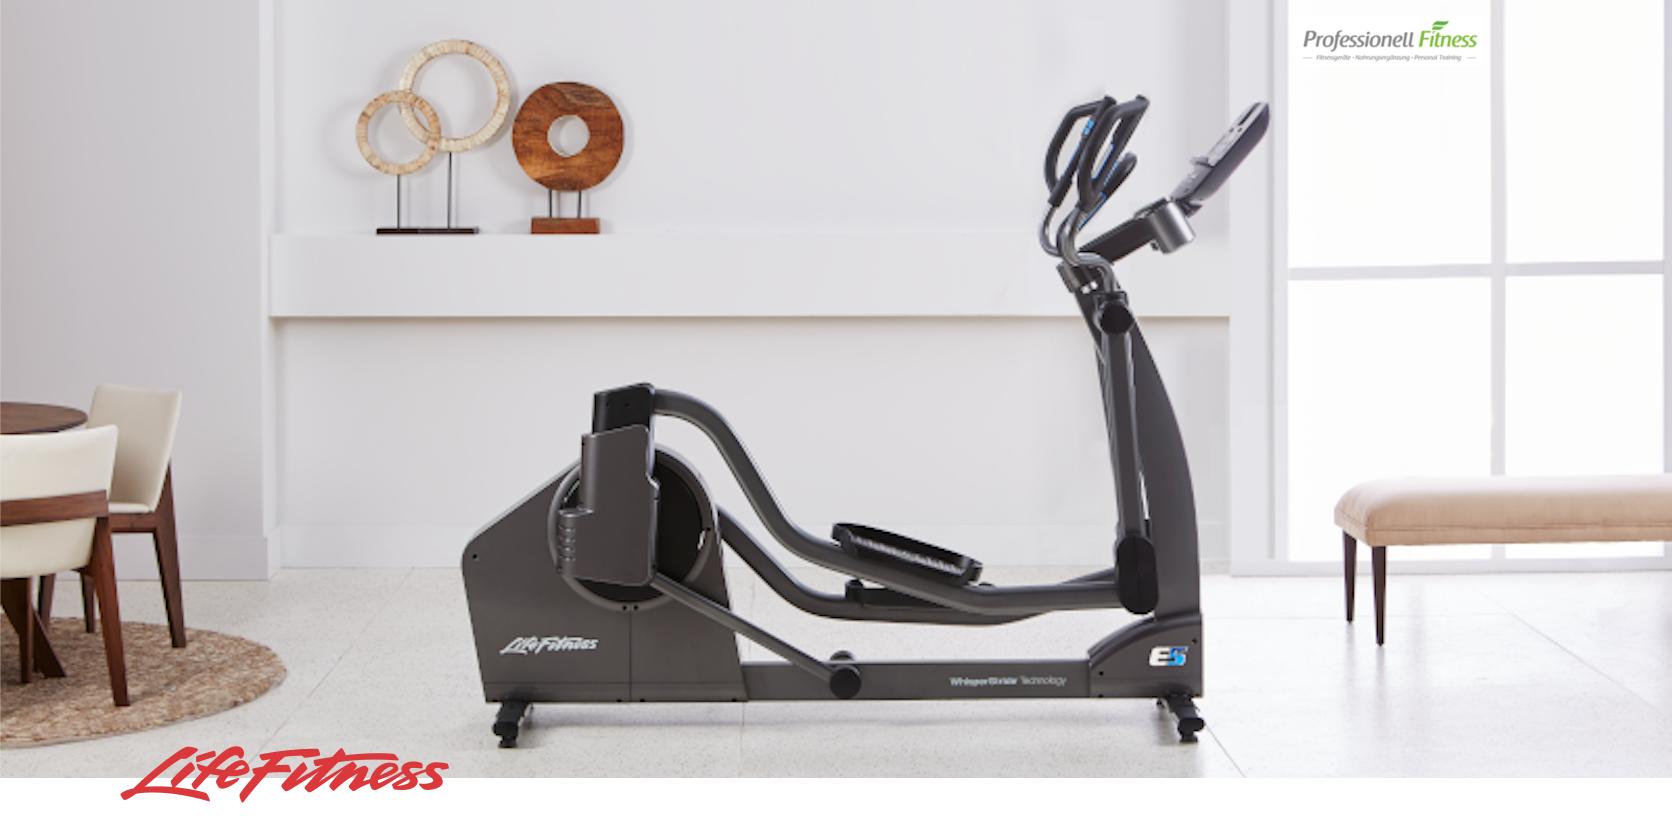 neues-Model-Life-Fitness-Crosstrainer-E5hcZS8tehDtNwx